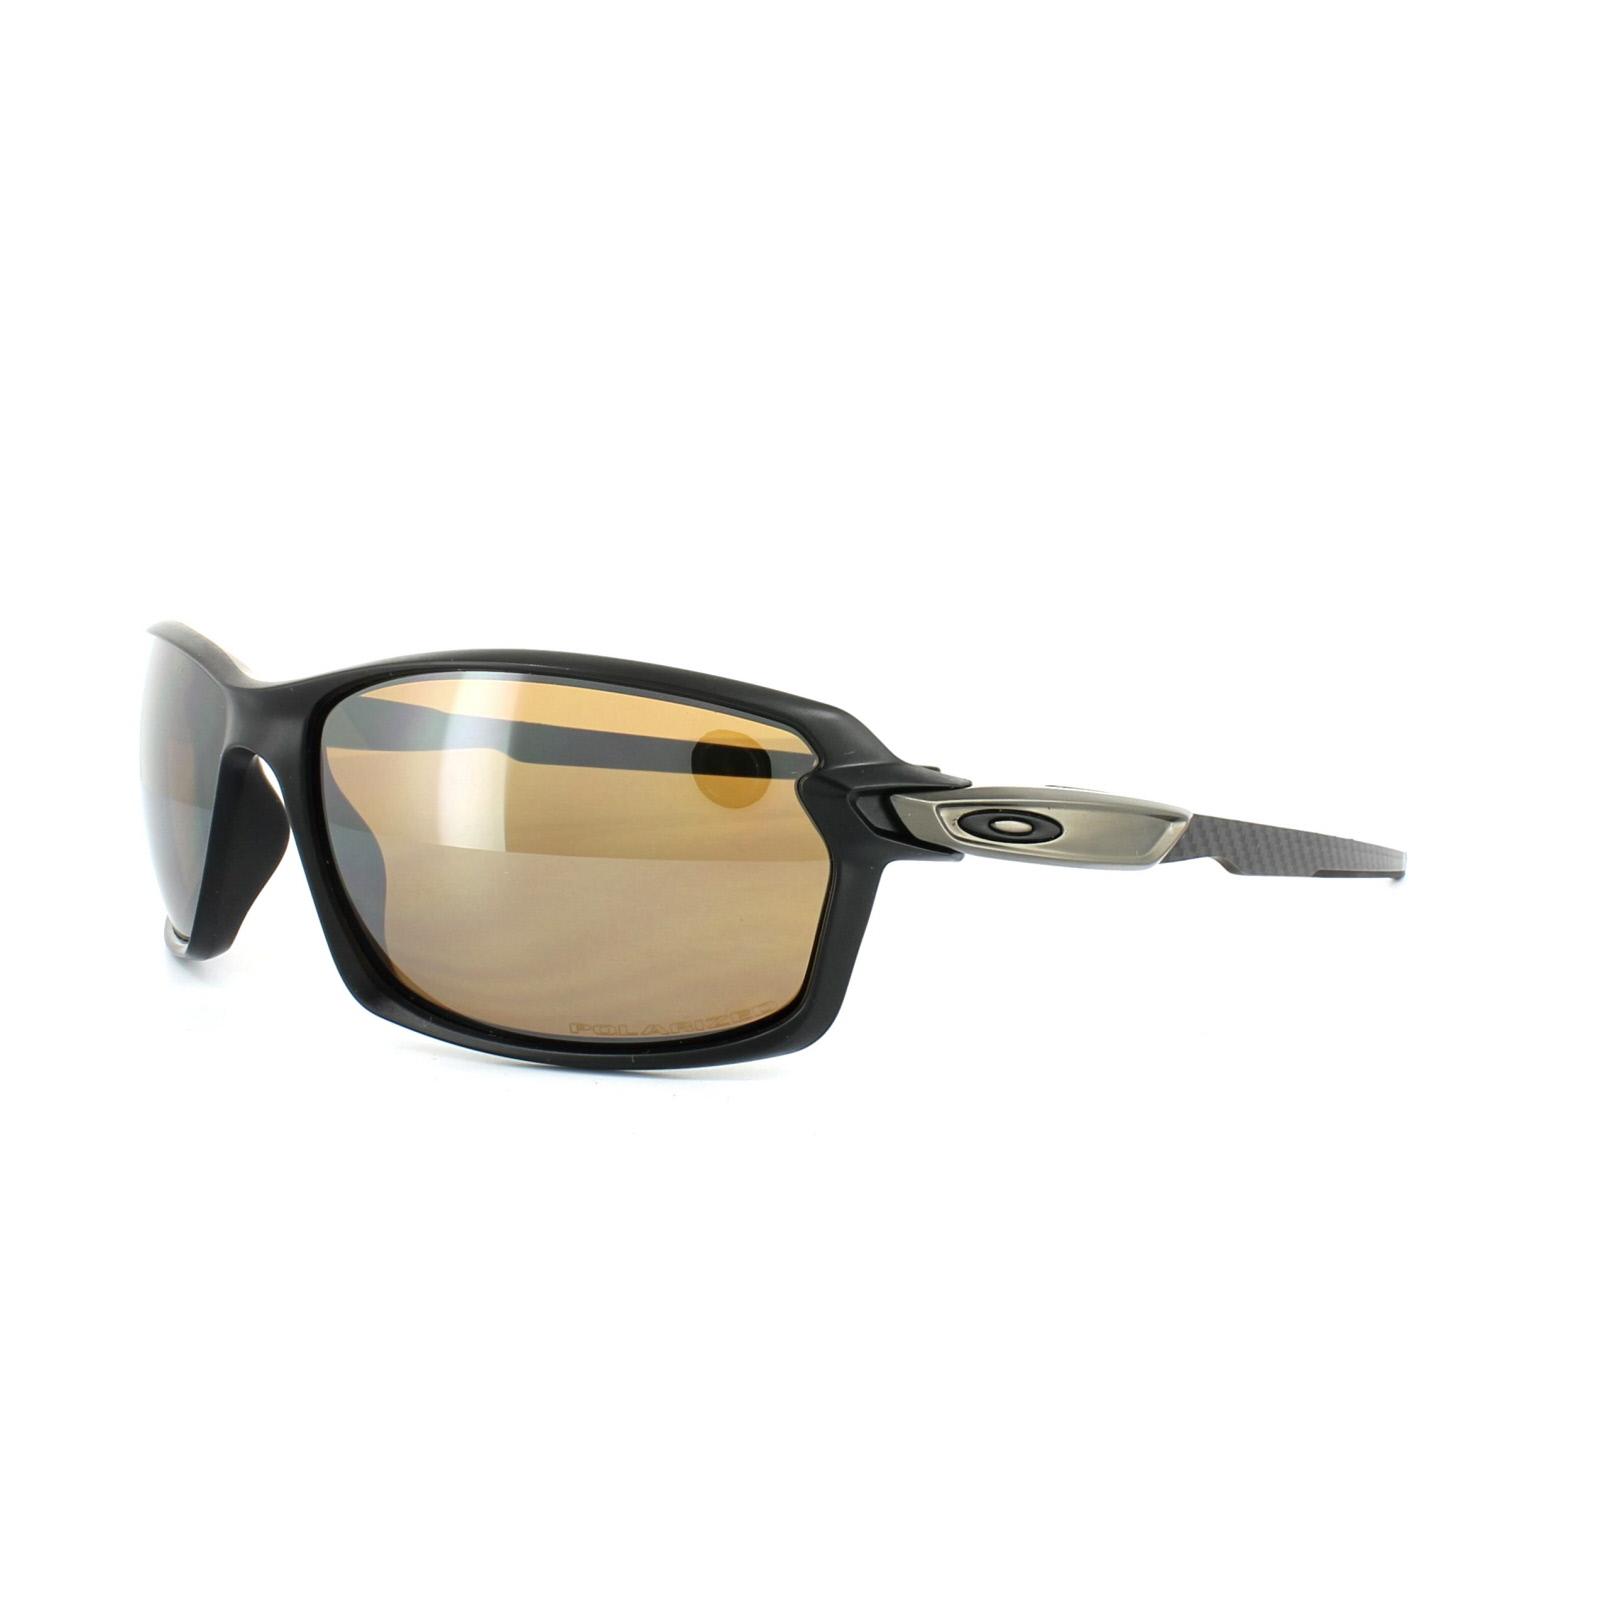 0cd1242469 Sentinel Oakley Sunglasses Carbon Shift OO9302-05 Matt Black Tungsten Iridium  Polarized